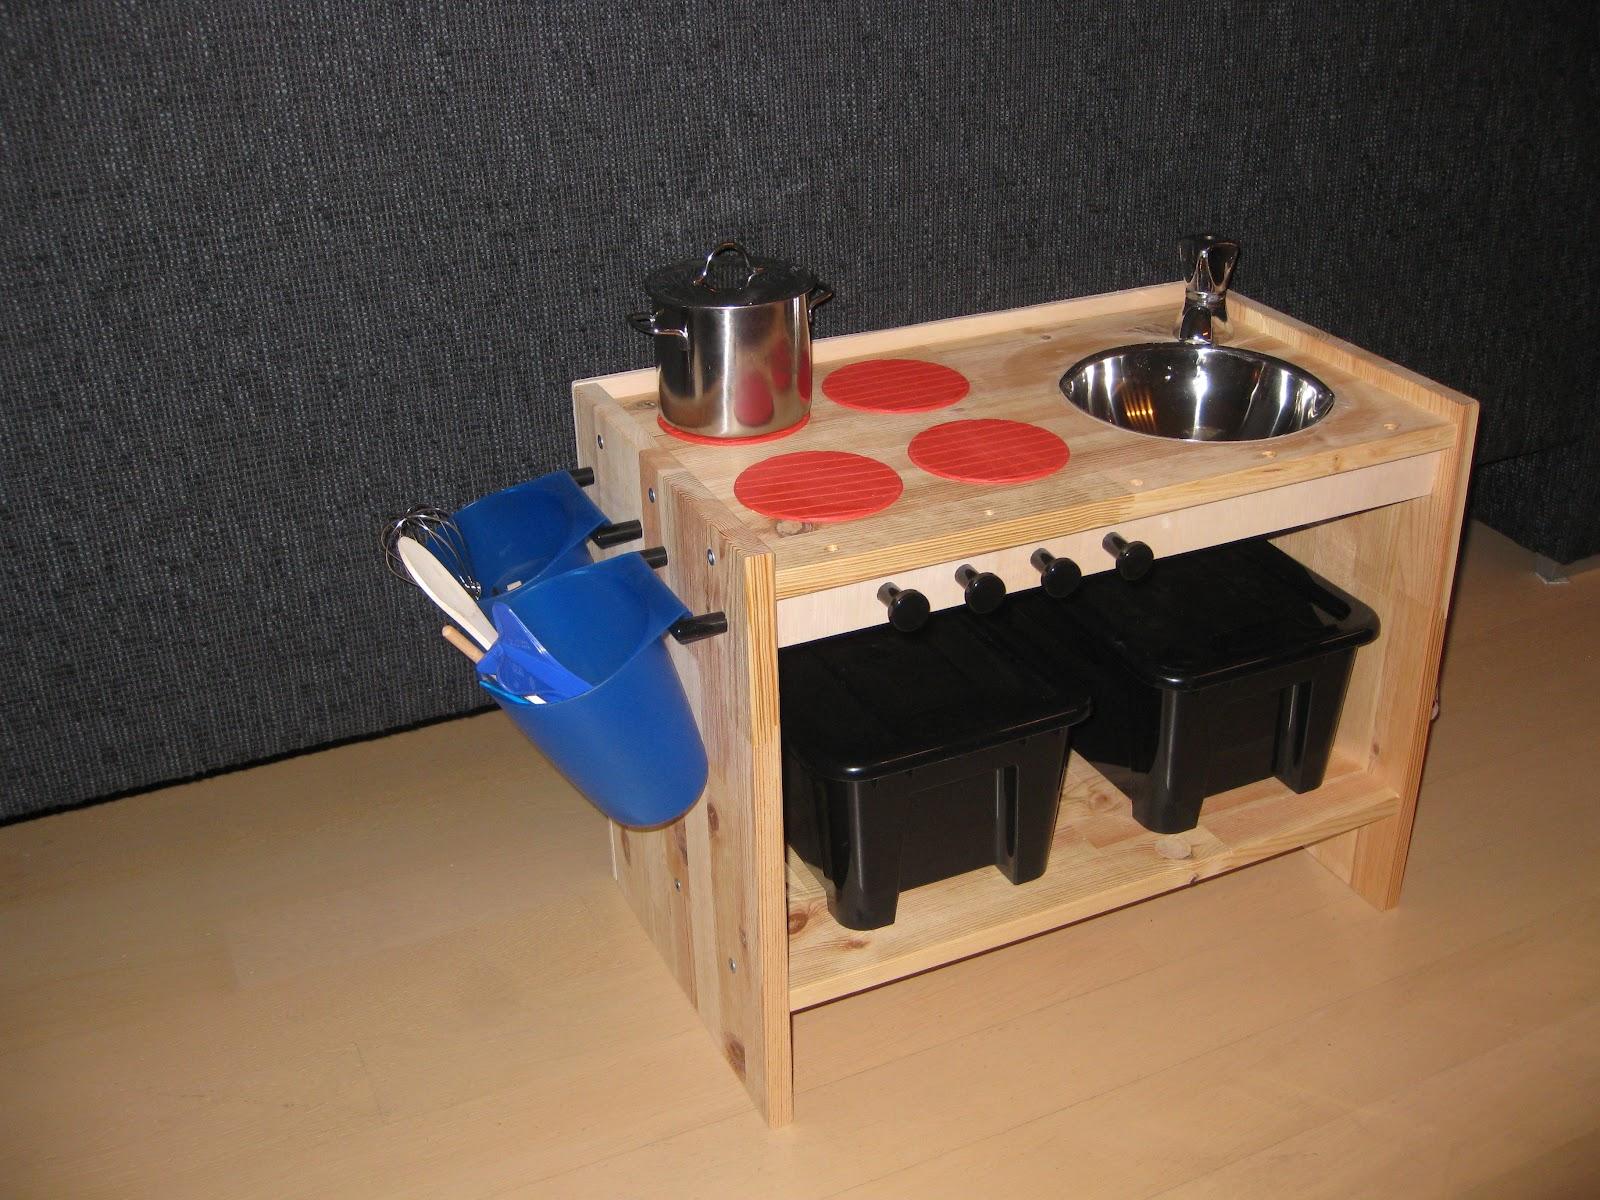 Ikea Houten Speelgoed Keukentje : DIY keukentje voor zo'n ?30.